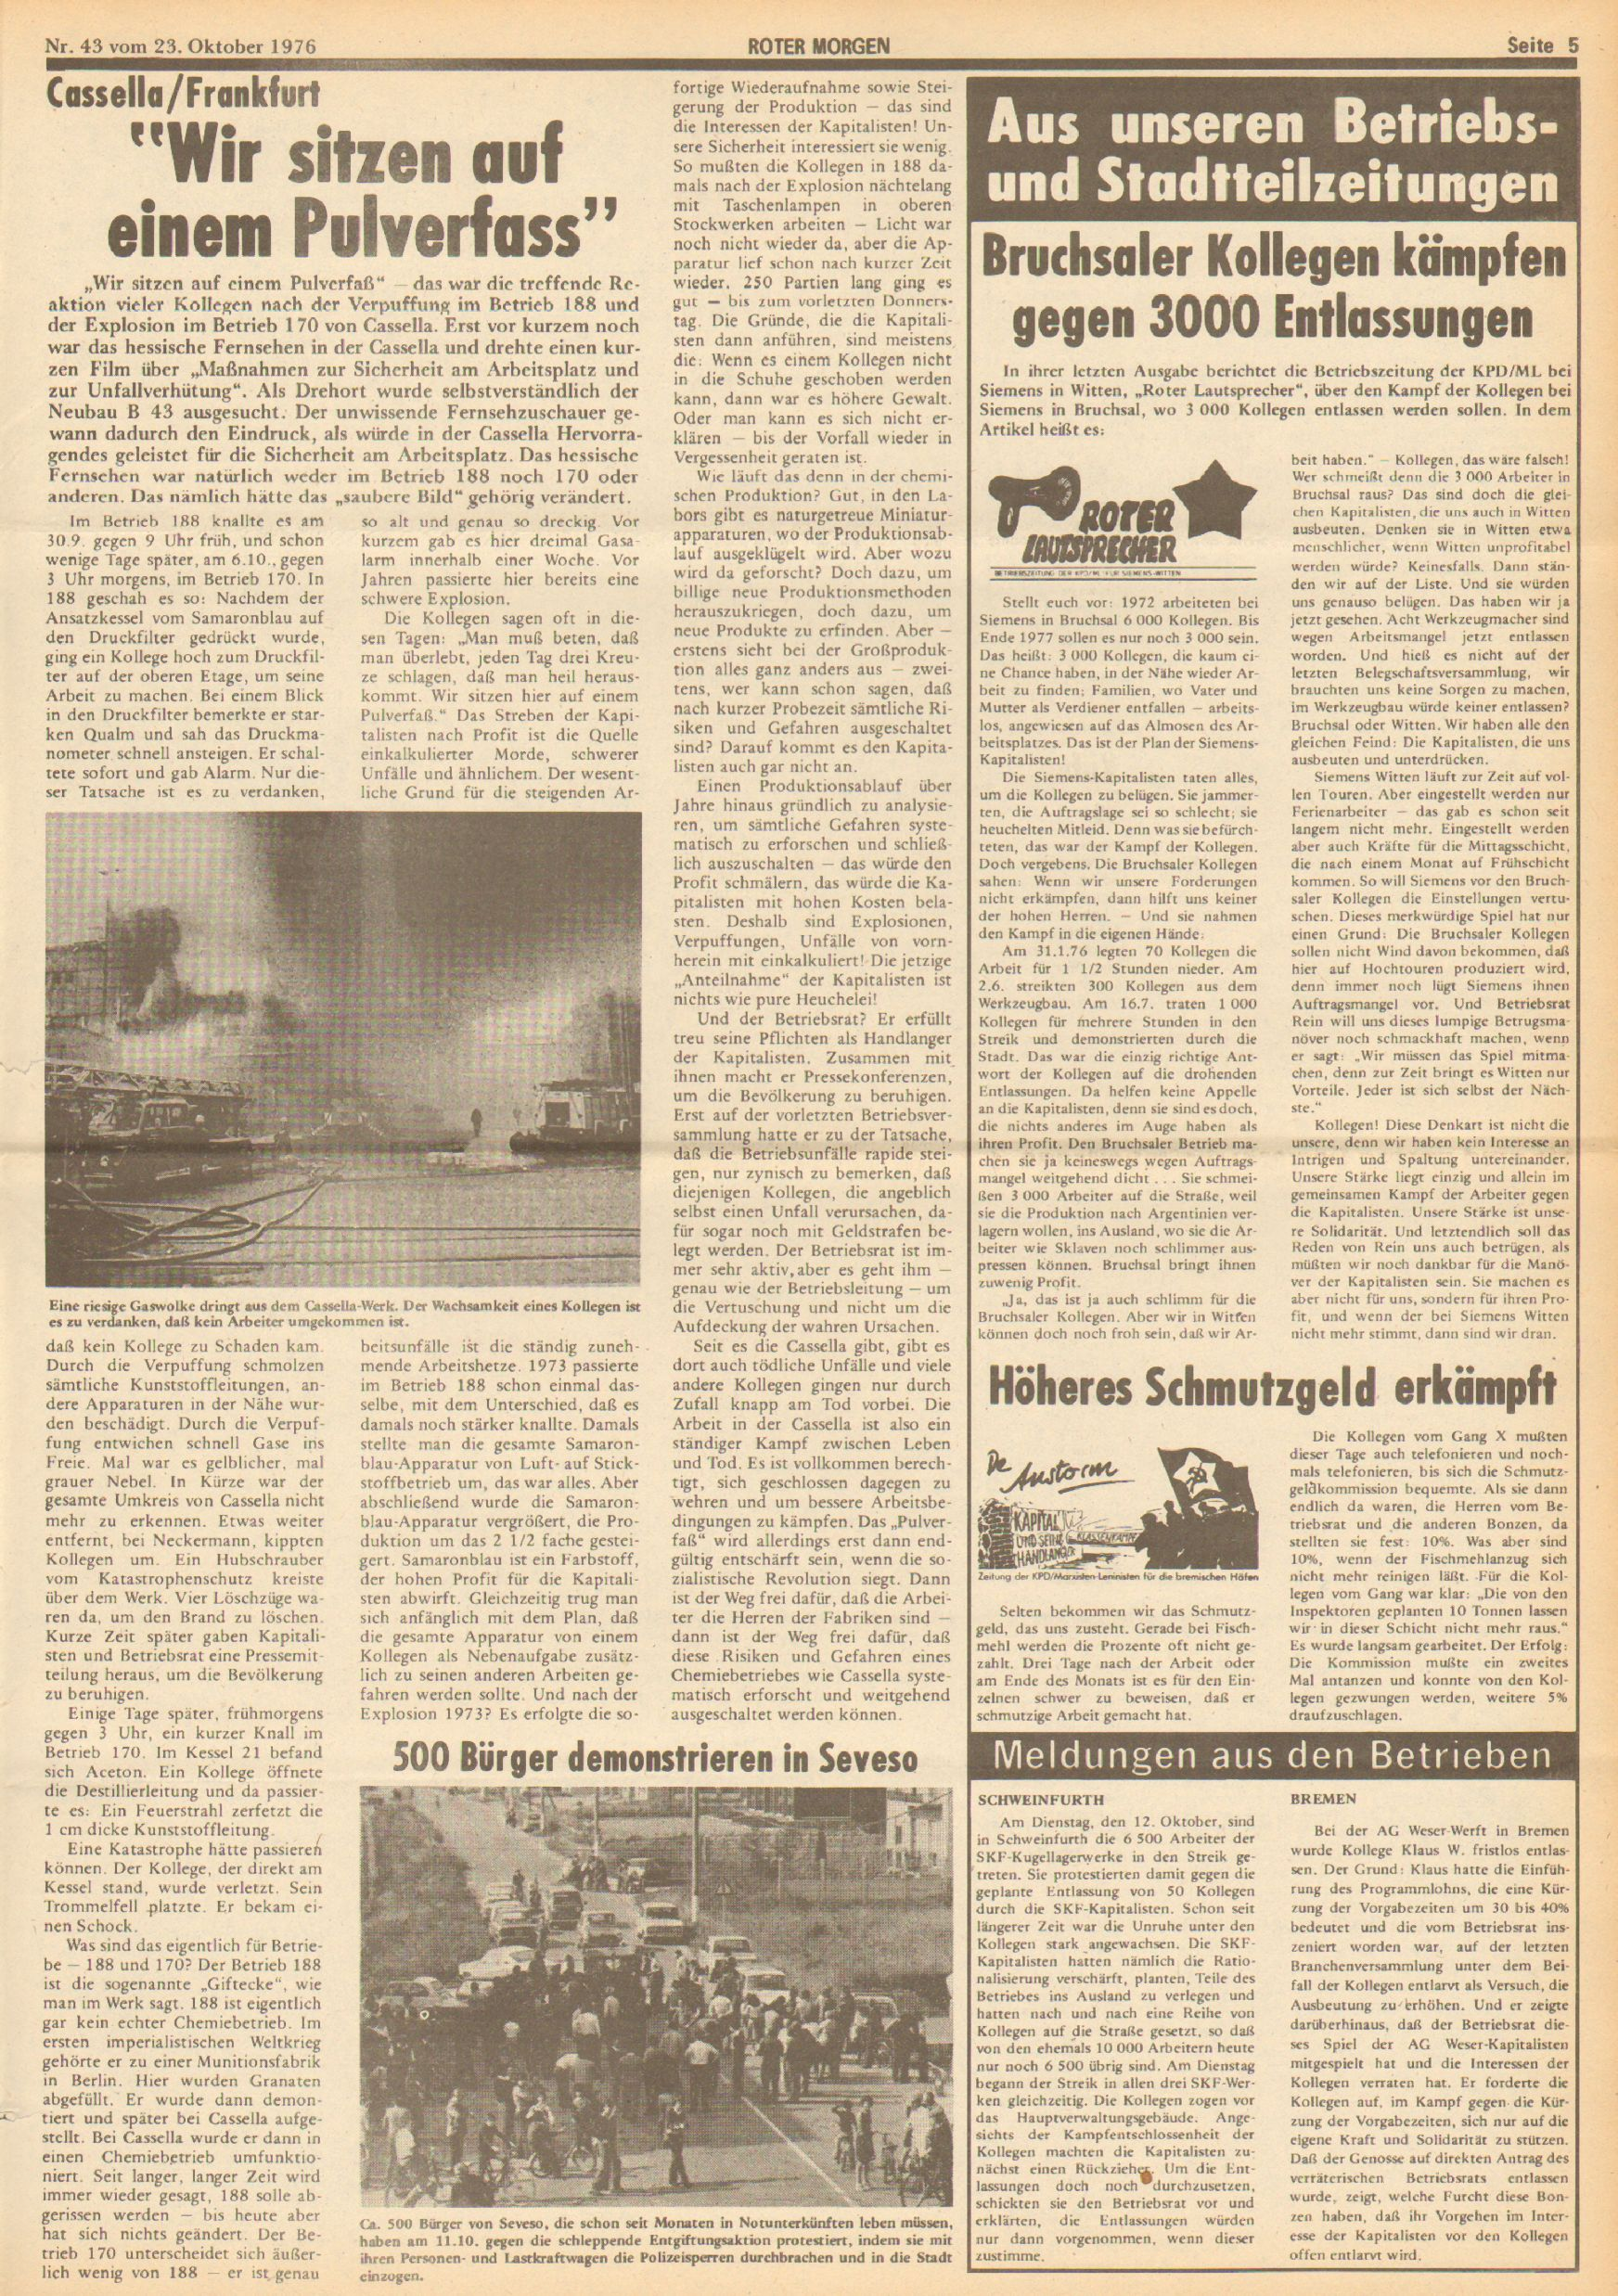 Roter Morgen, 10. Jg., 23. Oktober 1976, Nr. 43, Seite 5